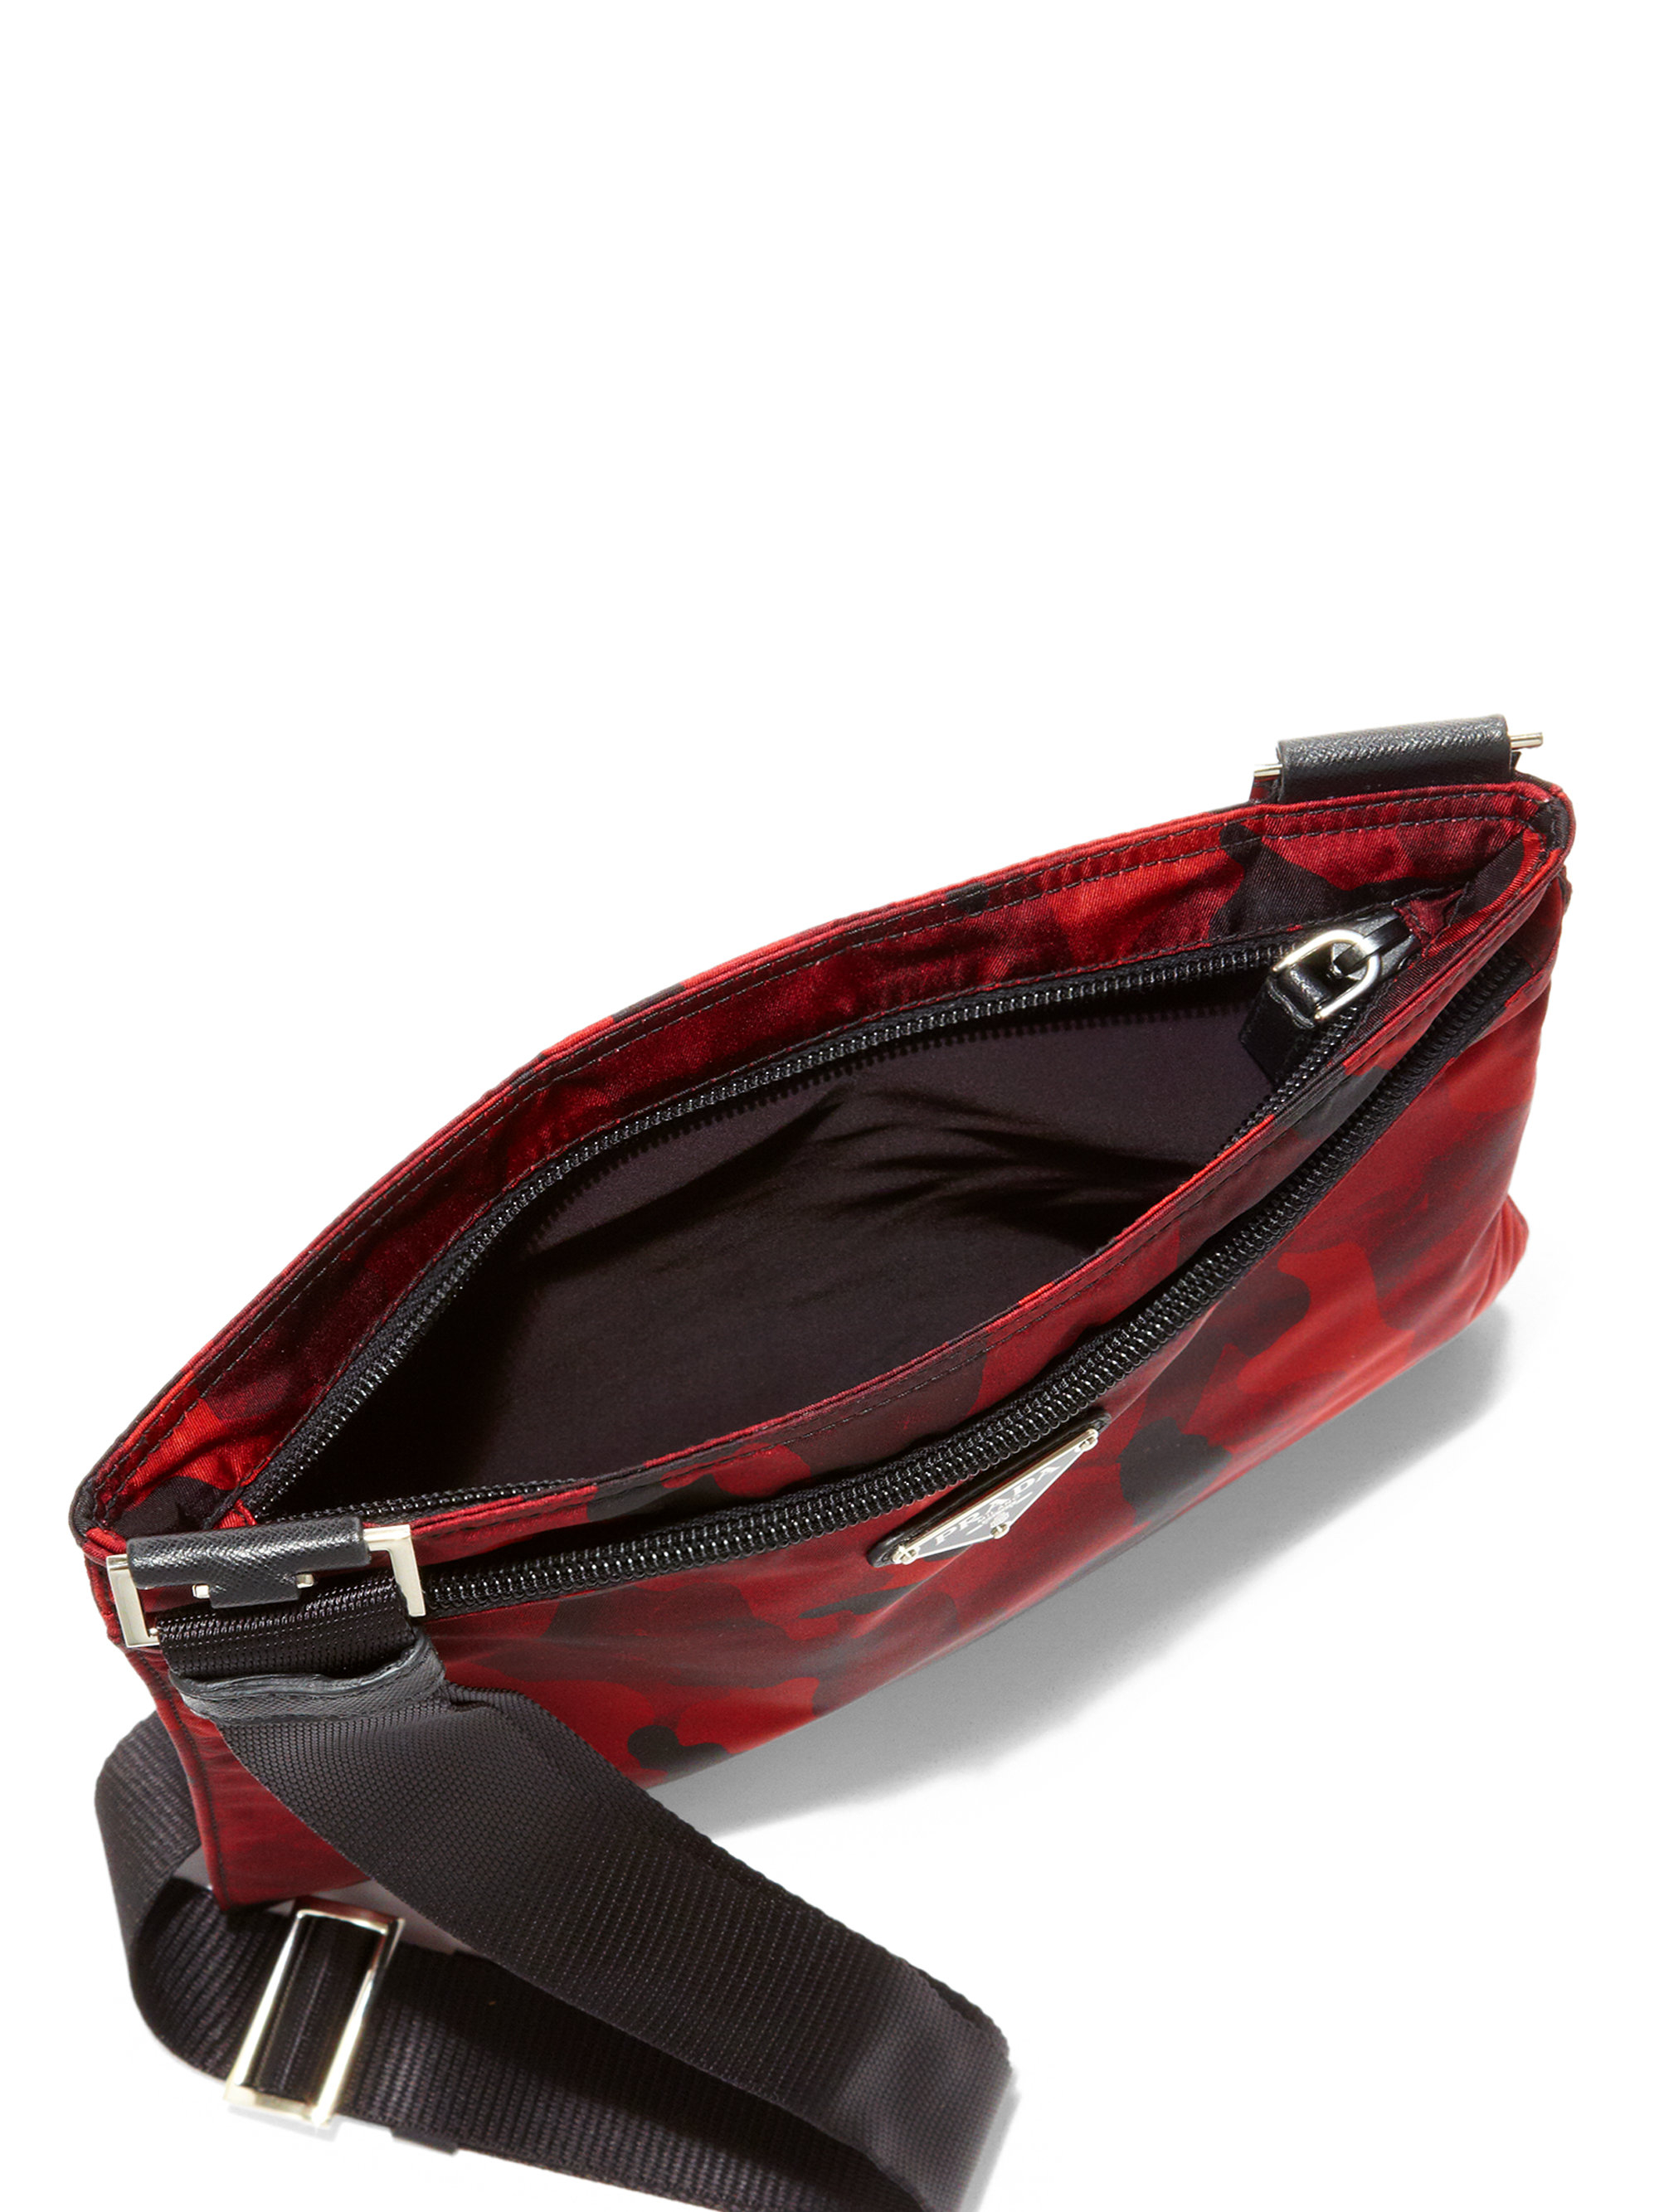 04143a880e473e Prada Tessuto Camouflage Small Crossbody Bag in Red - Lyst